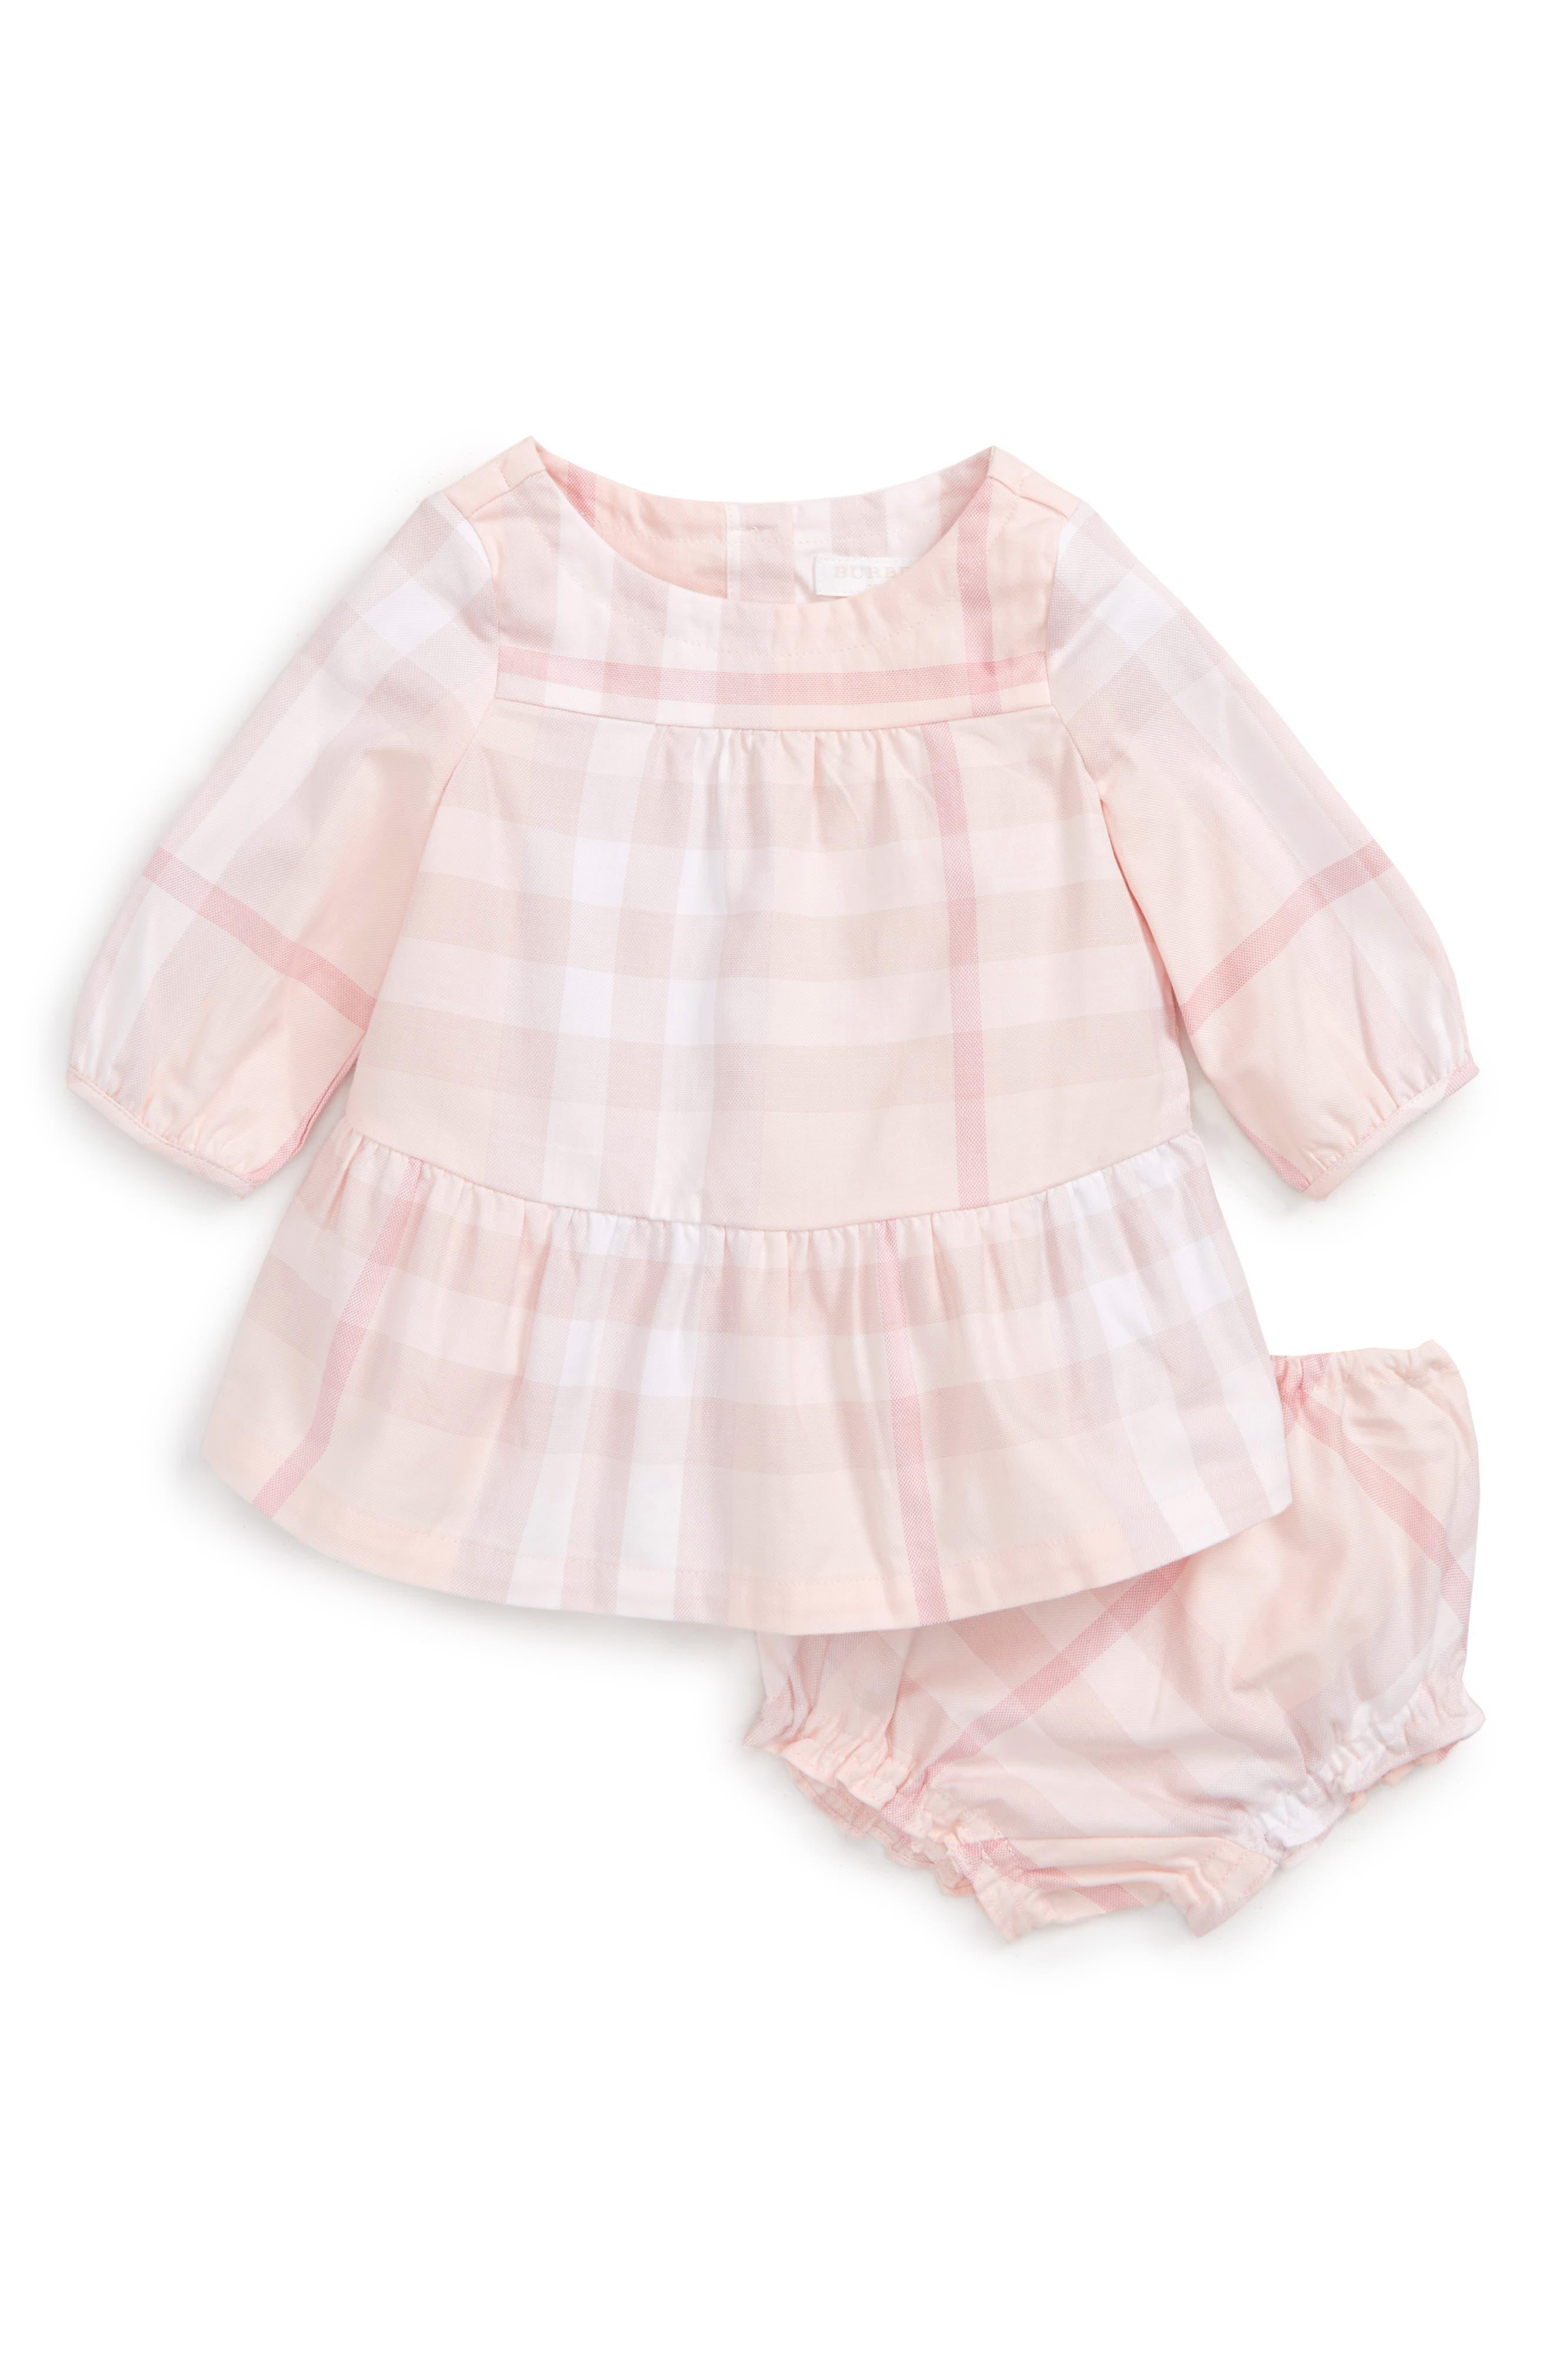 Kloey Dress,                         Main,                         color, Ice Pink